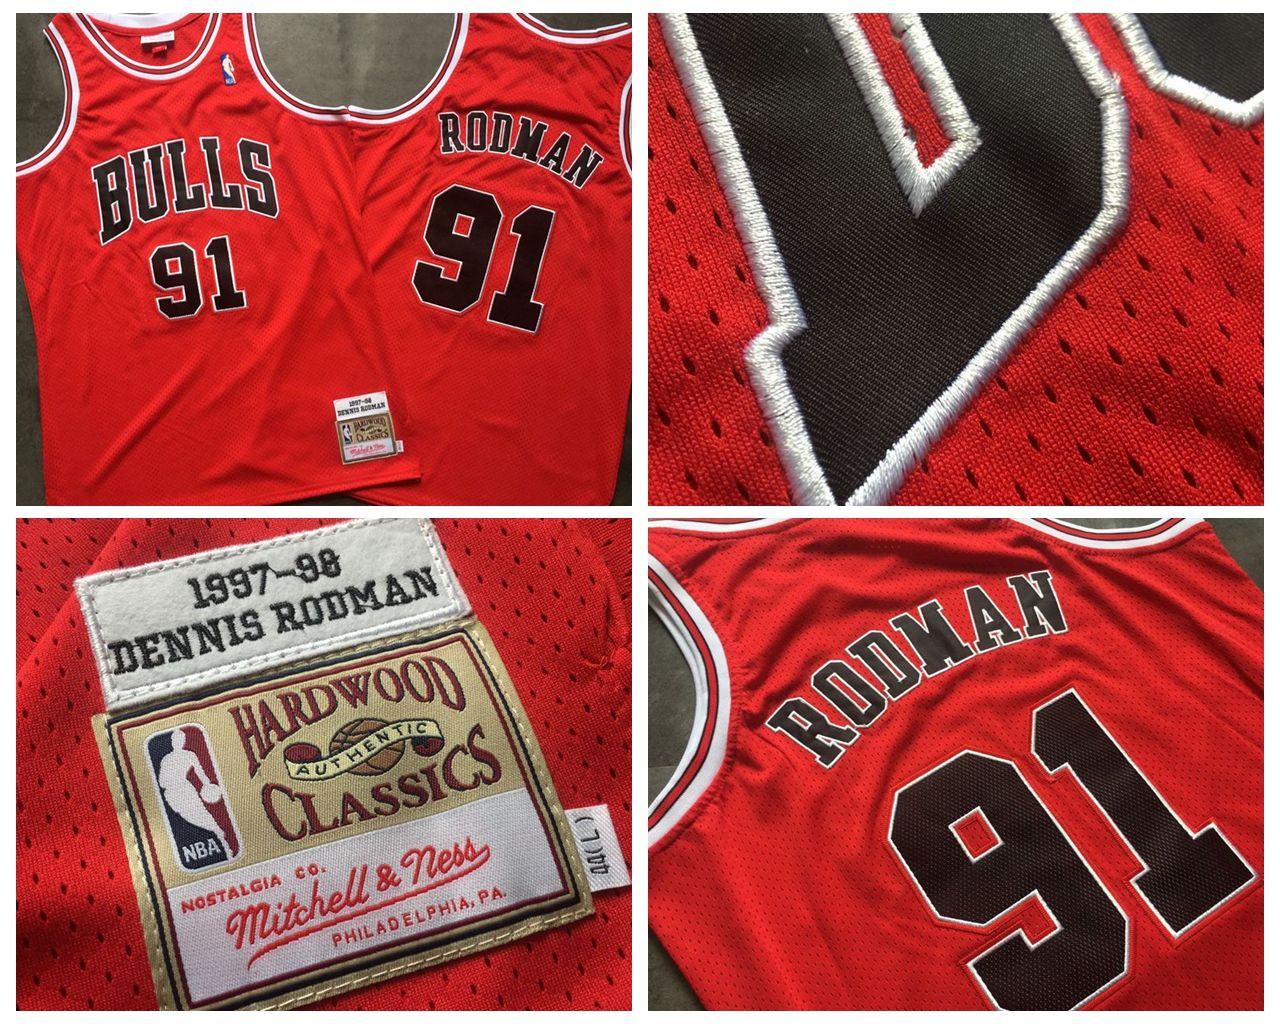 best website 66b50 01f8a Mitchell Ness Chicago Basketball Bulls Jersey 91# Dennis Rodman Dense AU  Fabric 1997-98 Mesh Retro Red Embroidery Jerseys